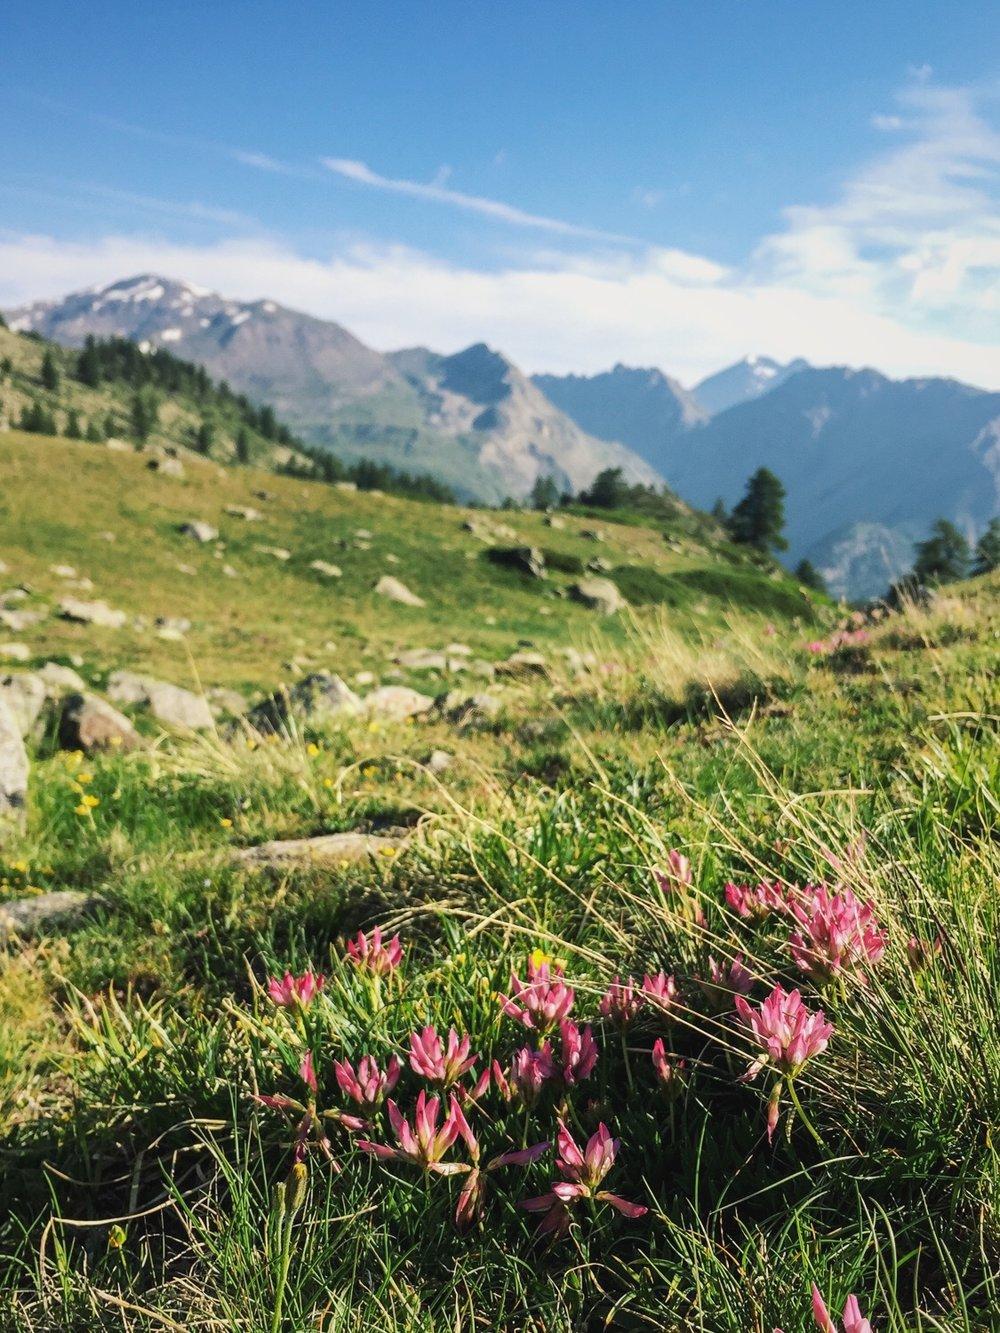 Rando vallée de la Clarée près de Briançon